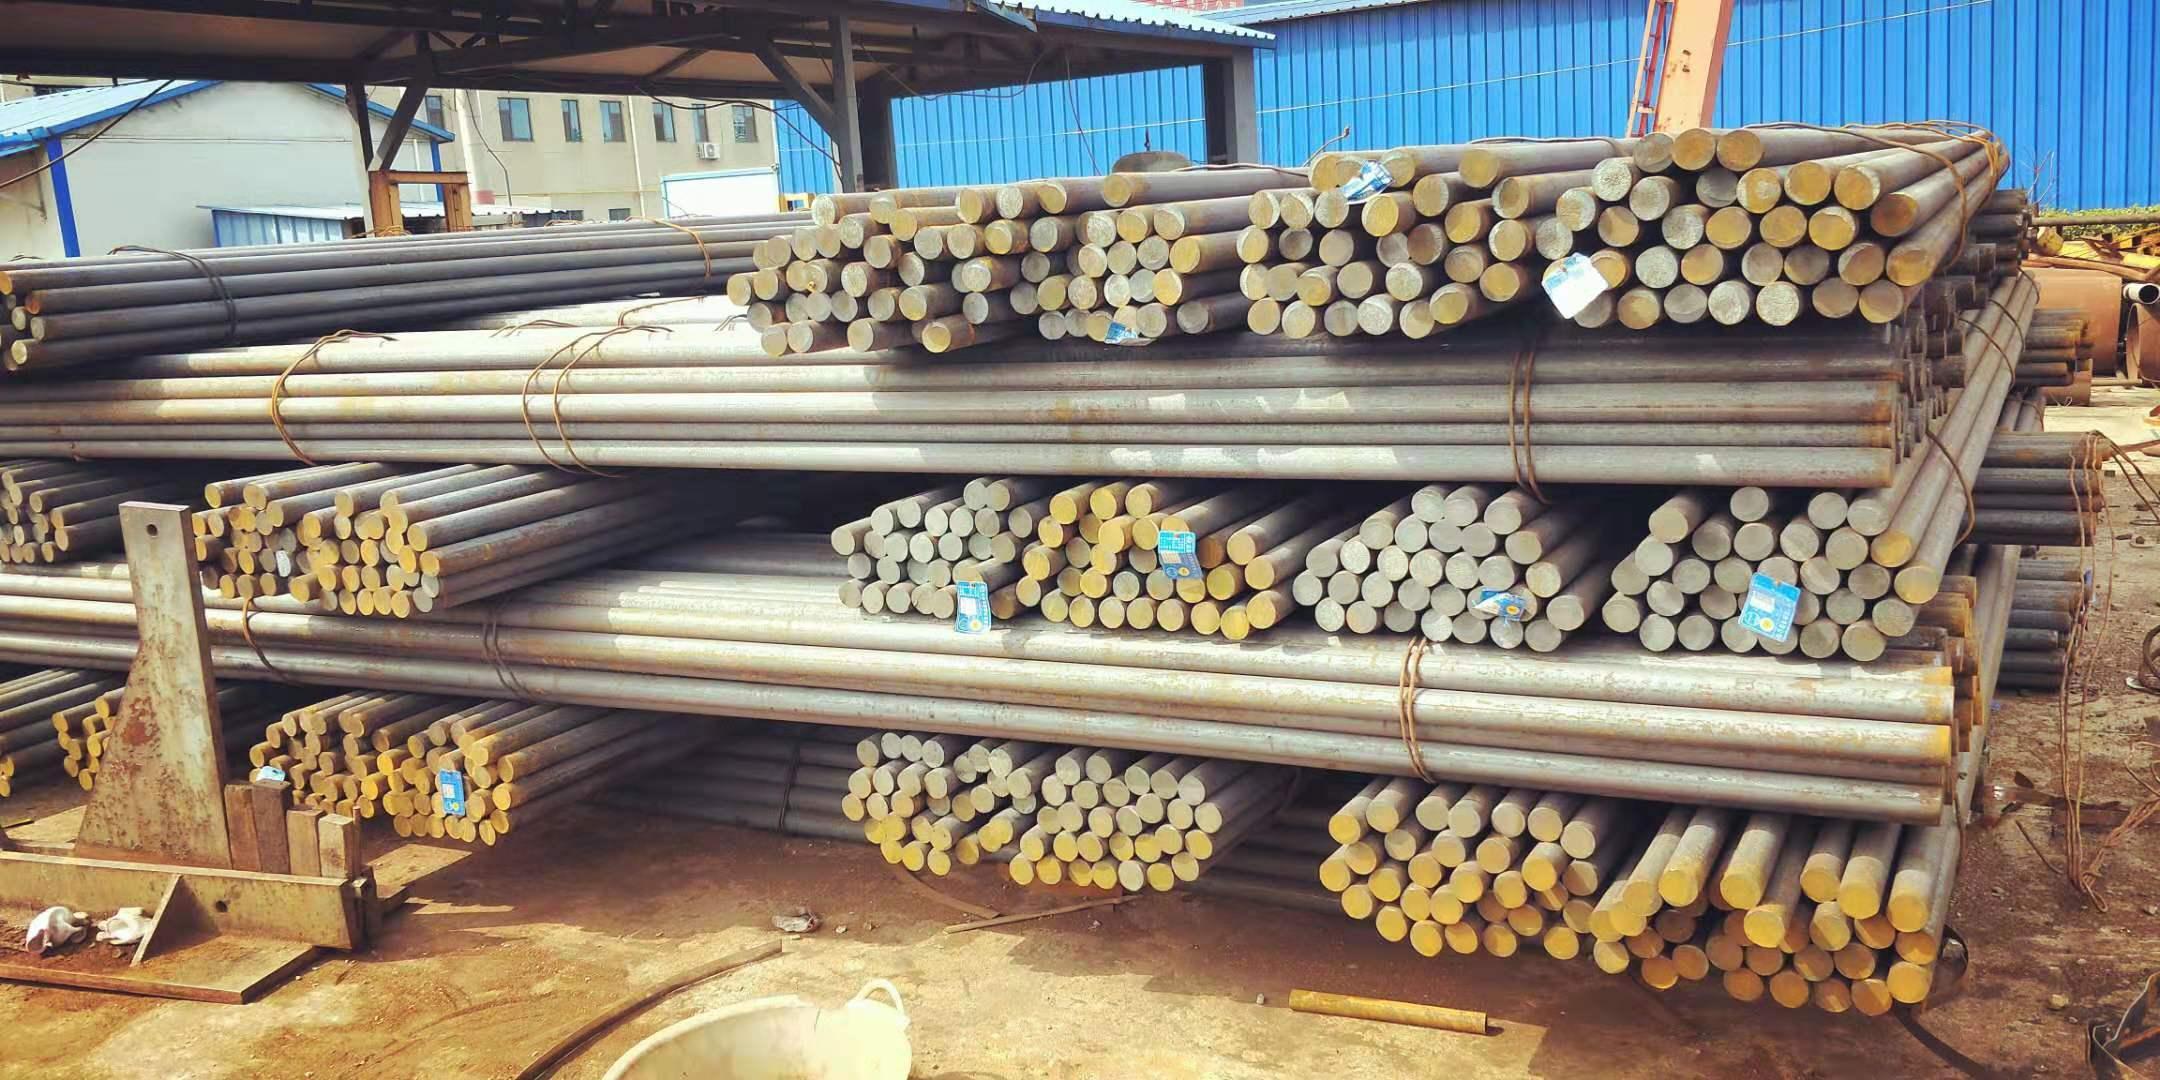 9Cr18MoV,5CrNiMo,9Cr2Mo,3Cr2W8V,4Cr9Si2,25Cr2MoV圆钢供应商报价